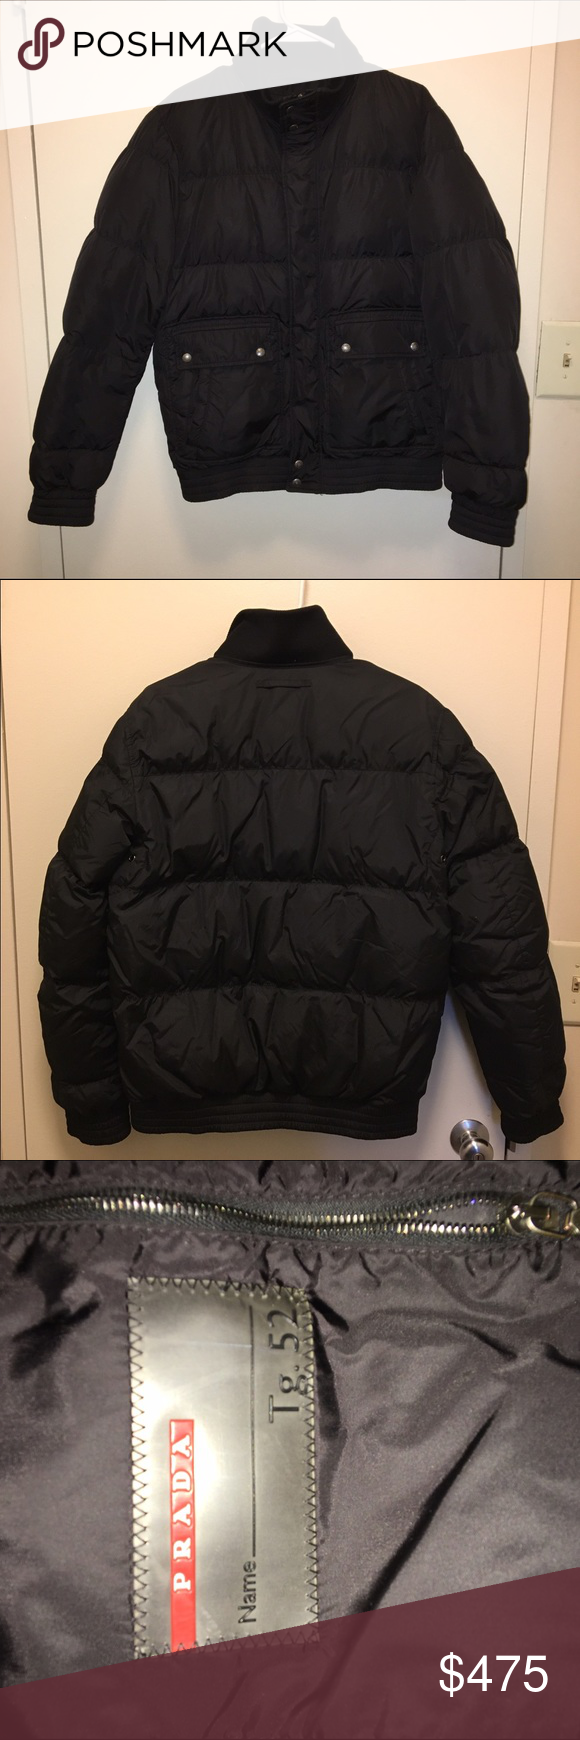 Prada Men S Down Coat Tg 52 Medium Prada Men Clothes Design Coat [ 1740 x 580 Pixel ]